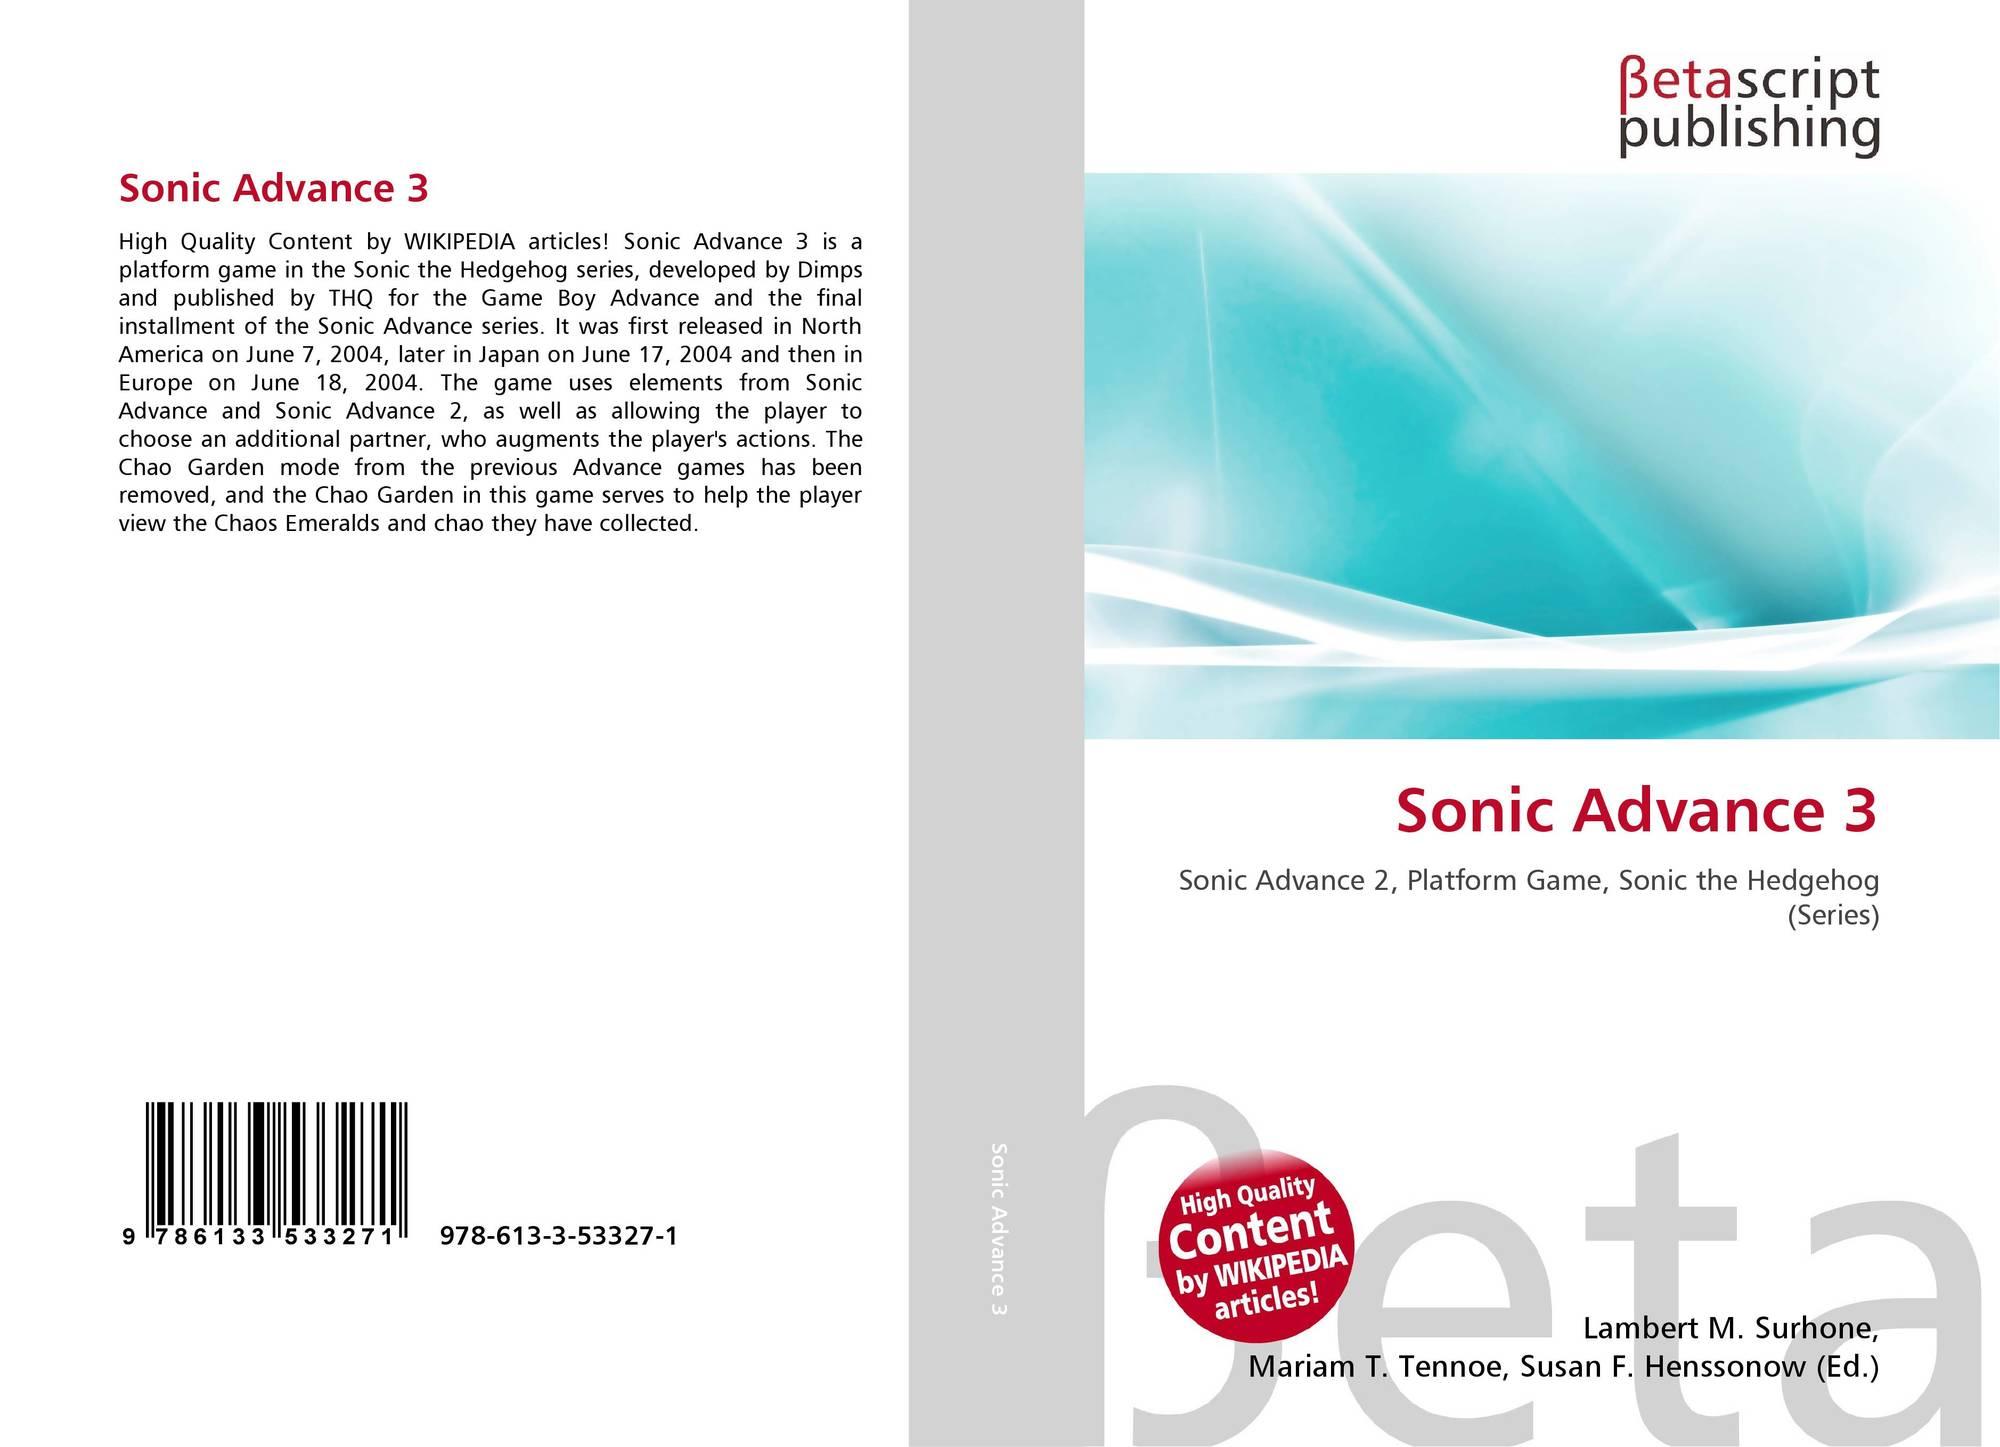 Sonic Advance 3, 978-613-3-53327-1, 6133533277 ,9786133533271